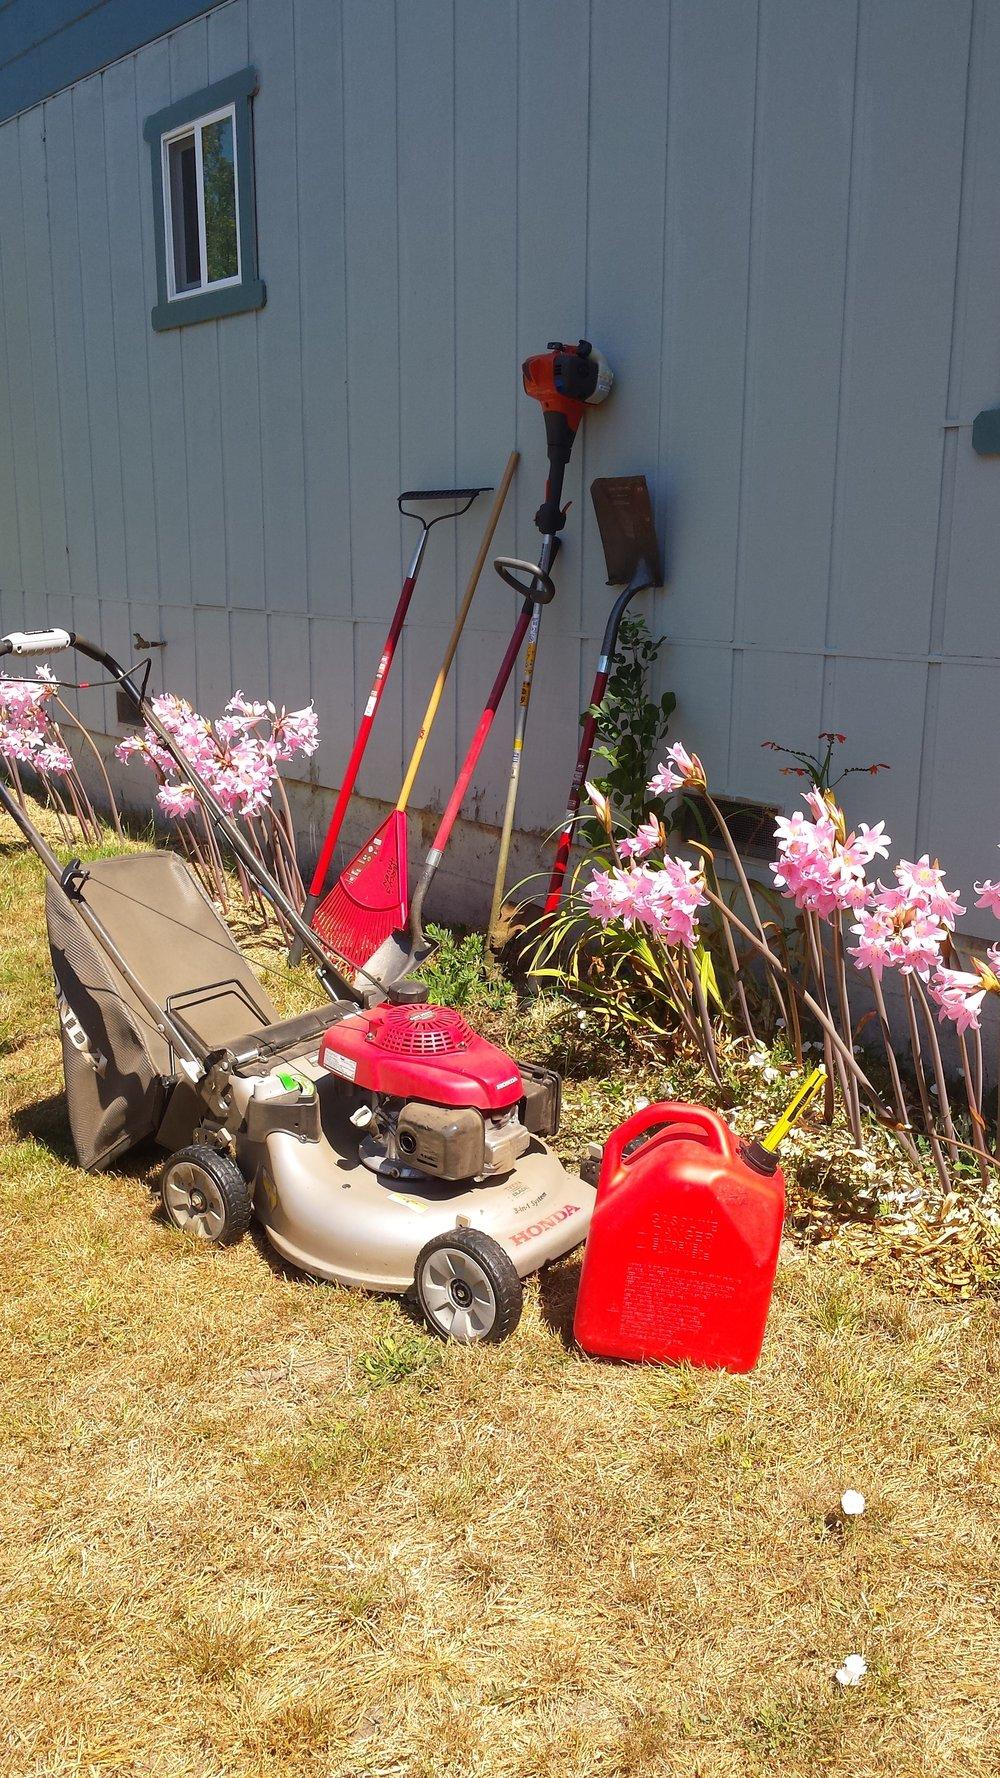 garden tools soroptimist.jpg